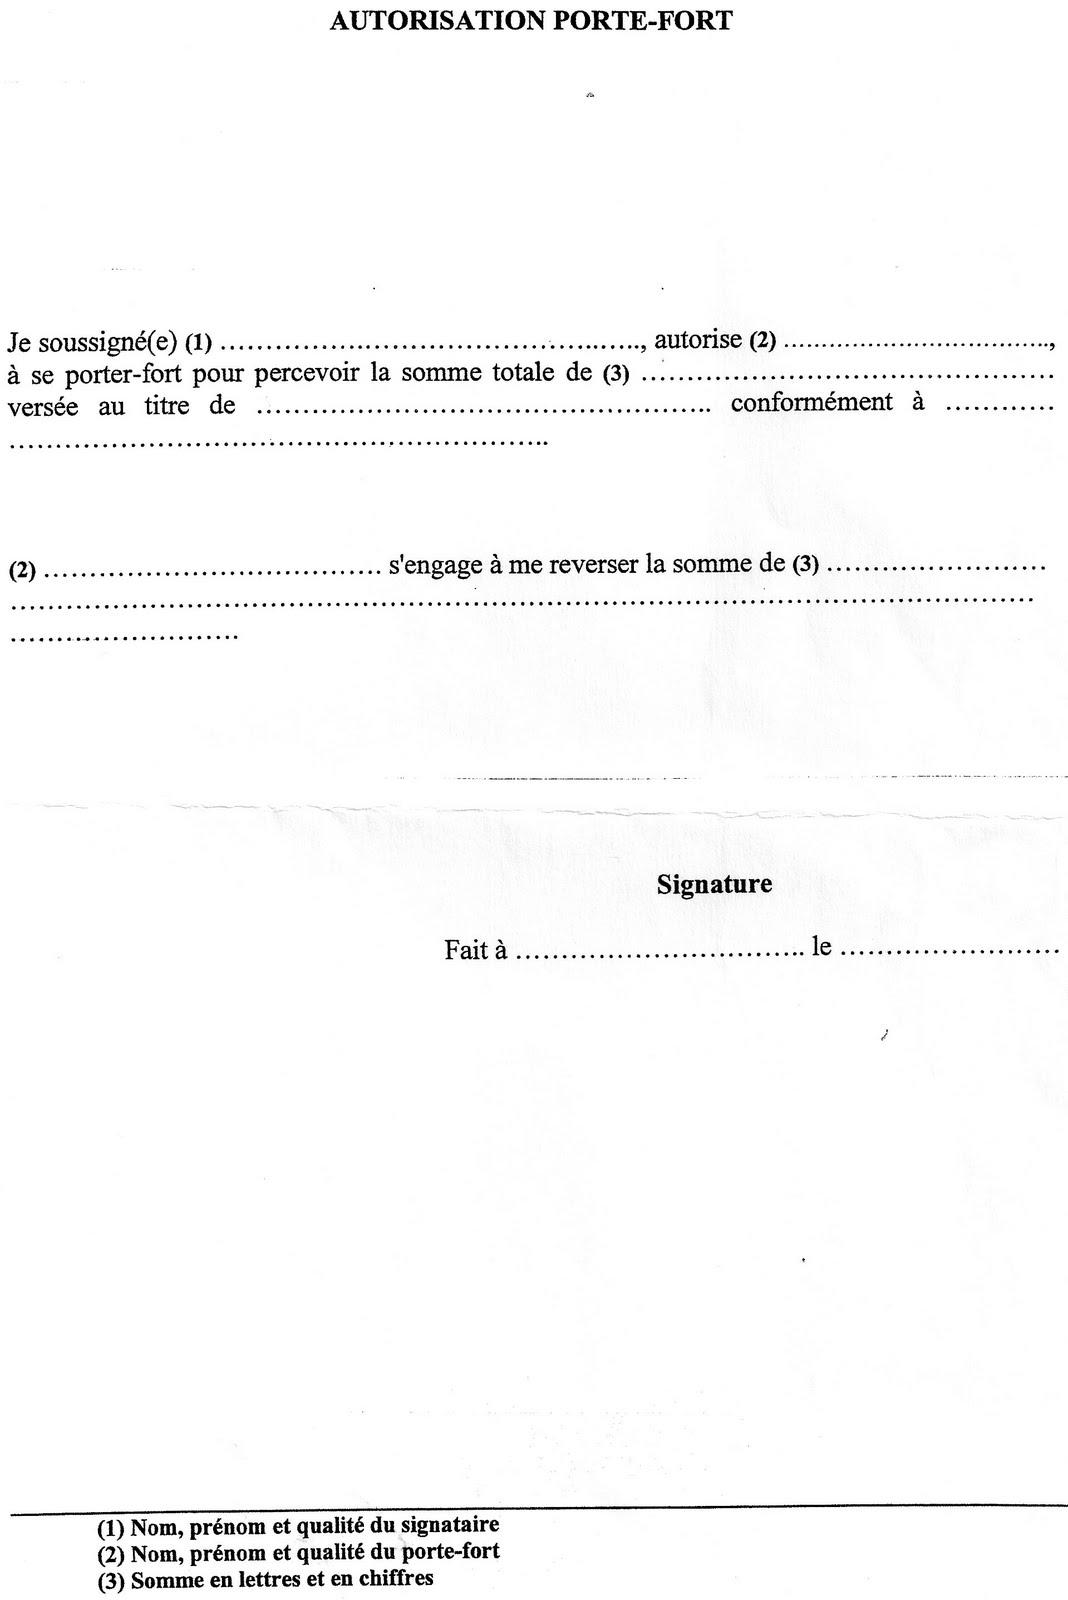 Modele procuration pour porte fort document online - Declaration porte fort heritier ...